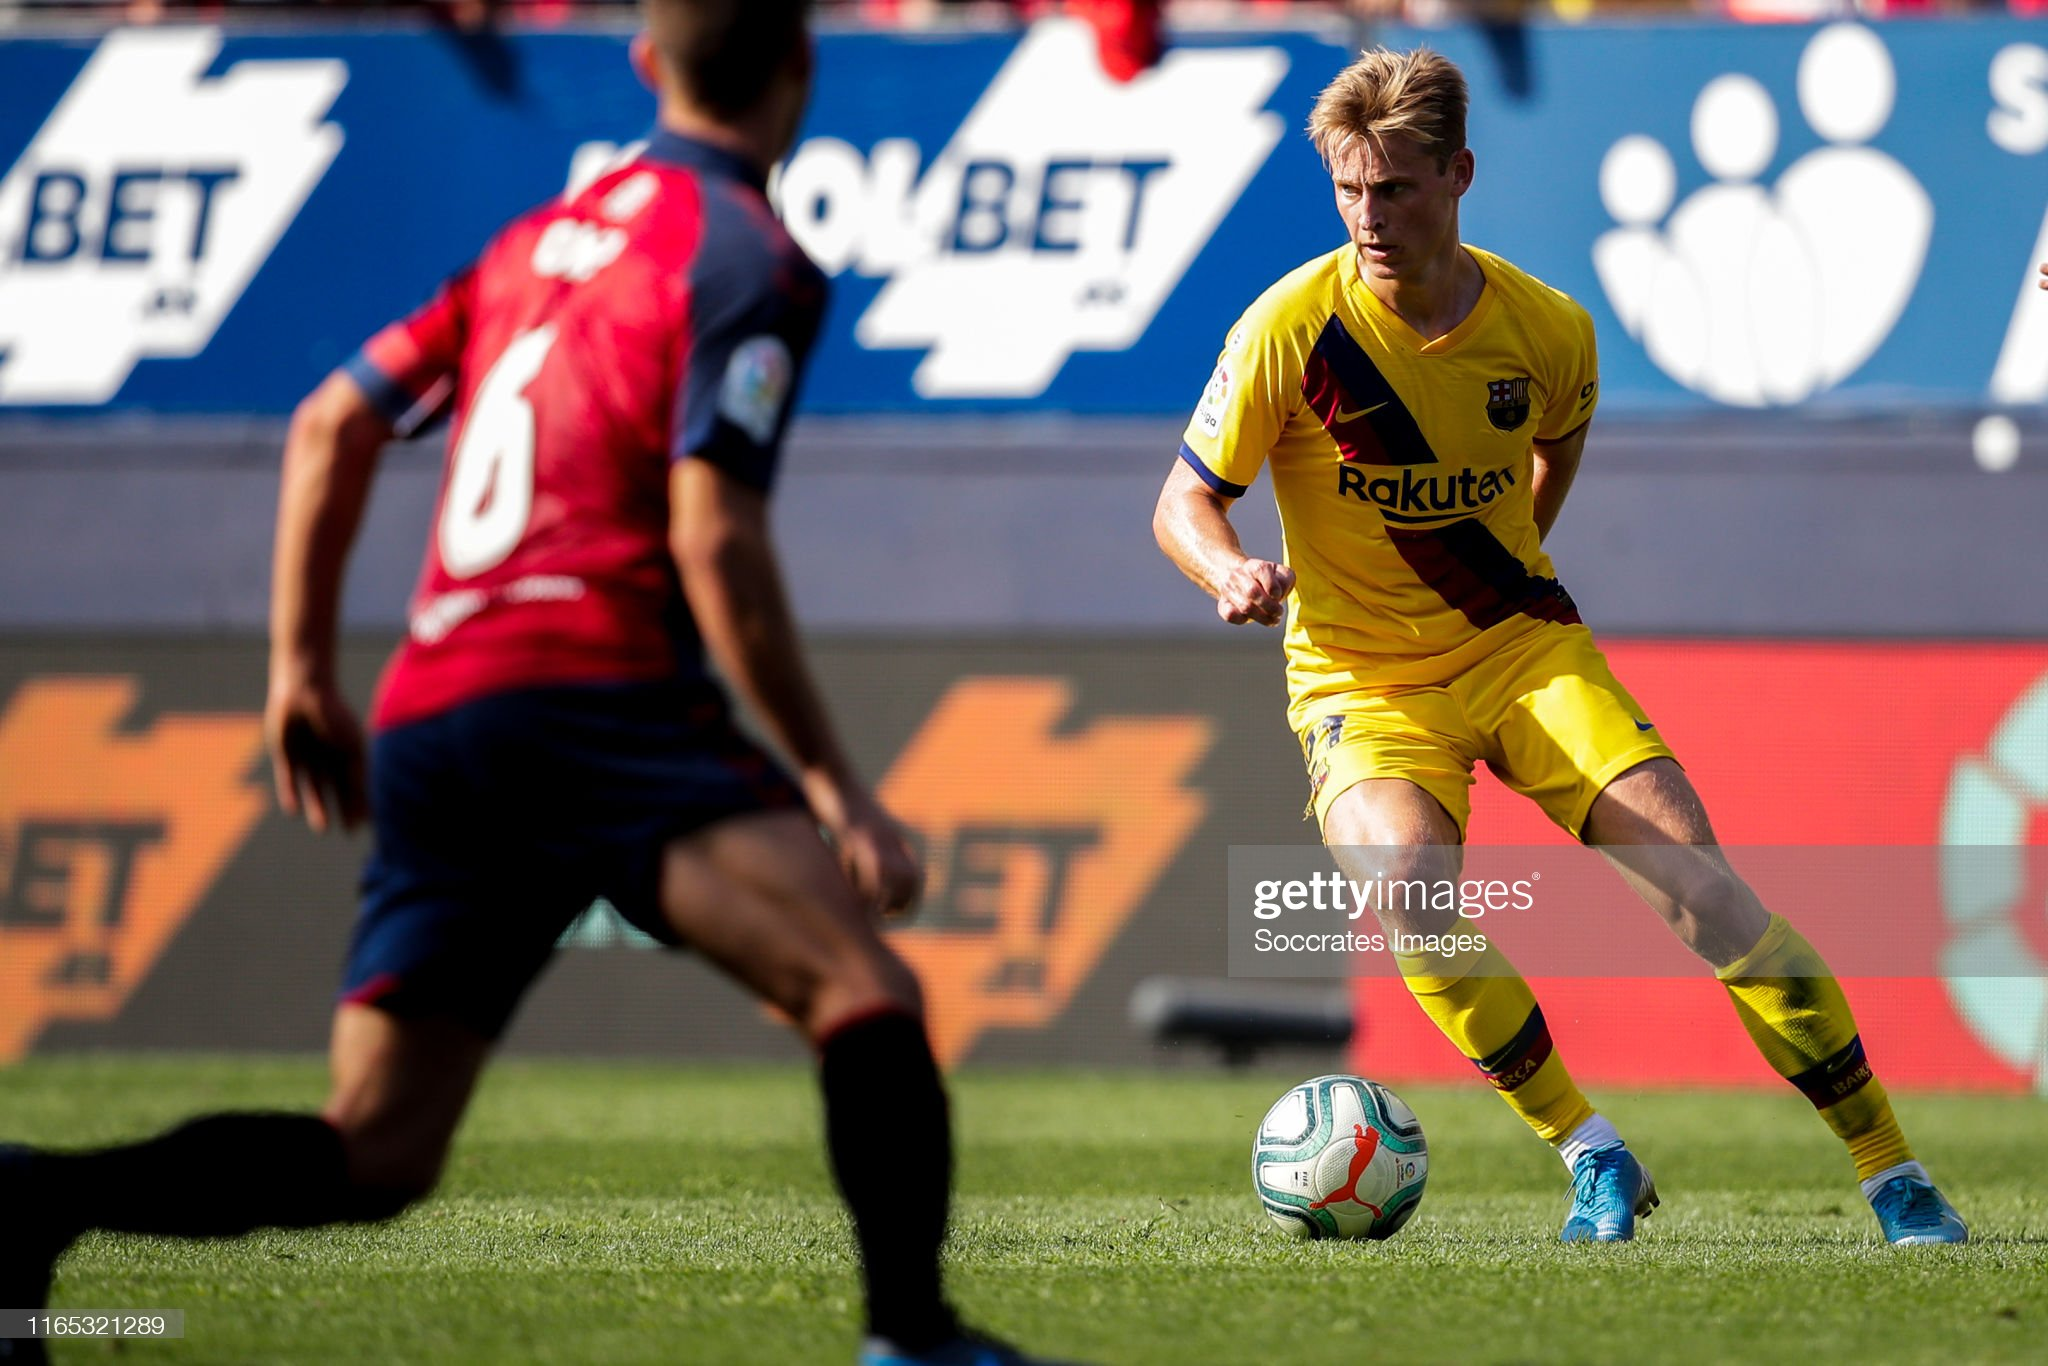 صور مباراة : أوساسونا - برشلونة 2-2 ( 31-08-2019 )  Frenkie-de-jong-of-fc-barcelona-during-the-la-liga-santander-match-picture-id1165321289?s=2048x2048